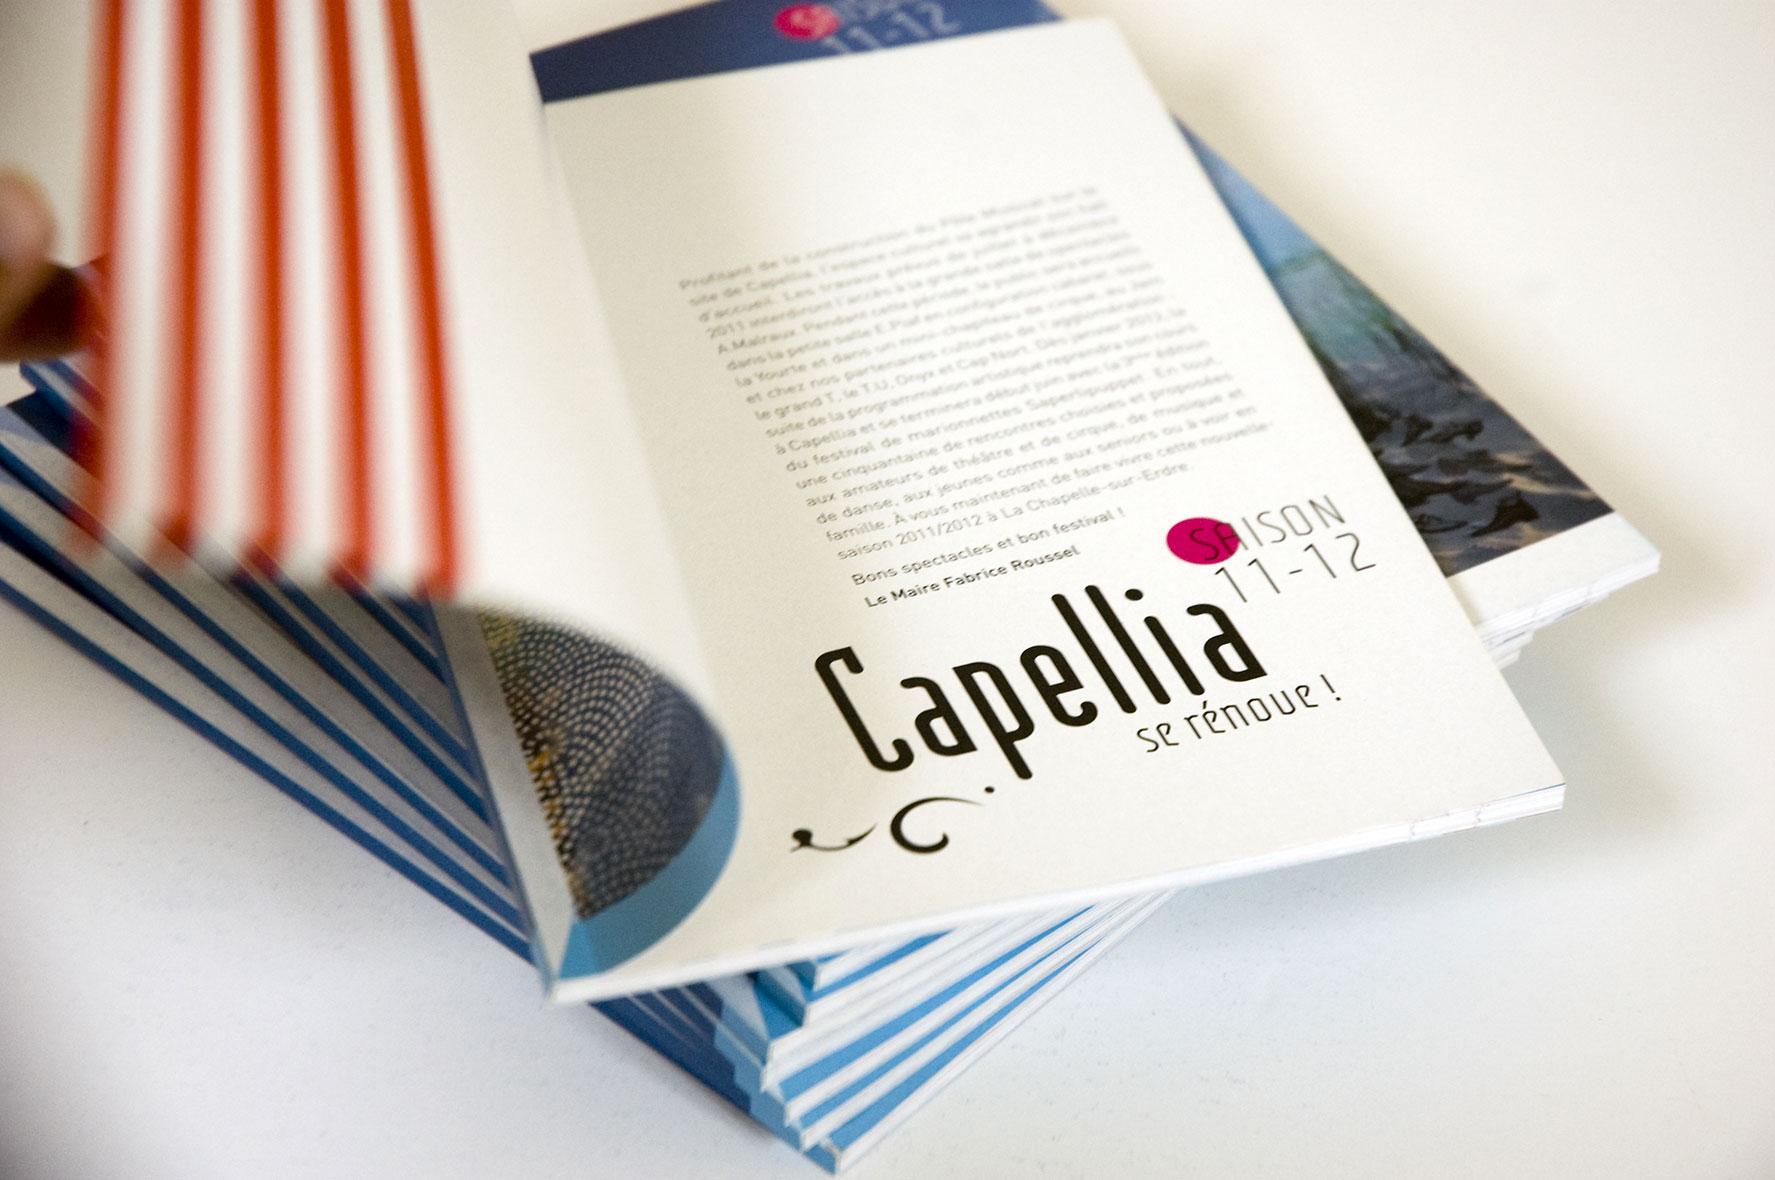 communication-culturelle-programme-edito-capellia-Alcali-Nathalie-Mineau-DA-design-graphique-Nantes